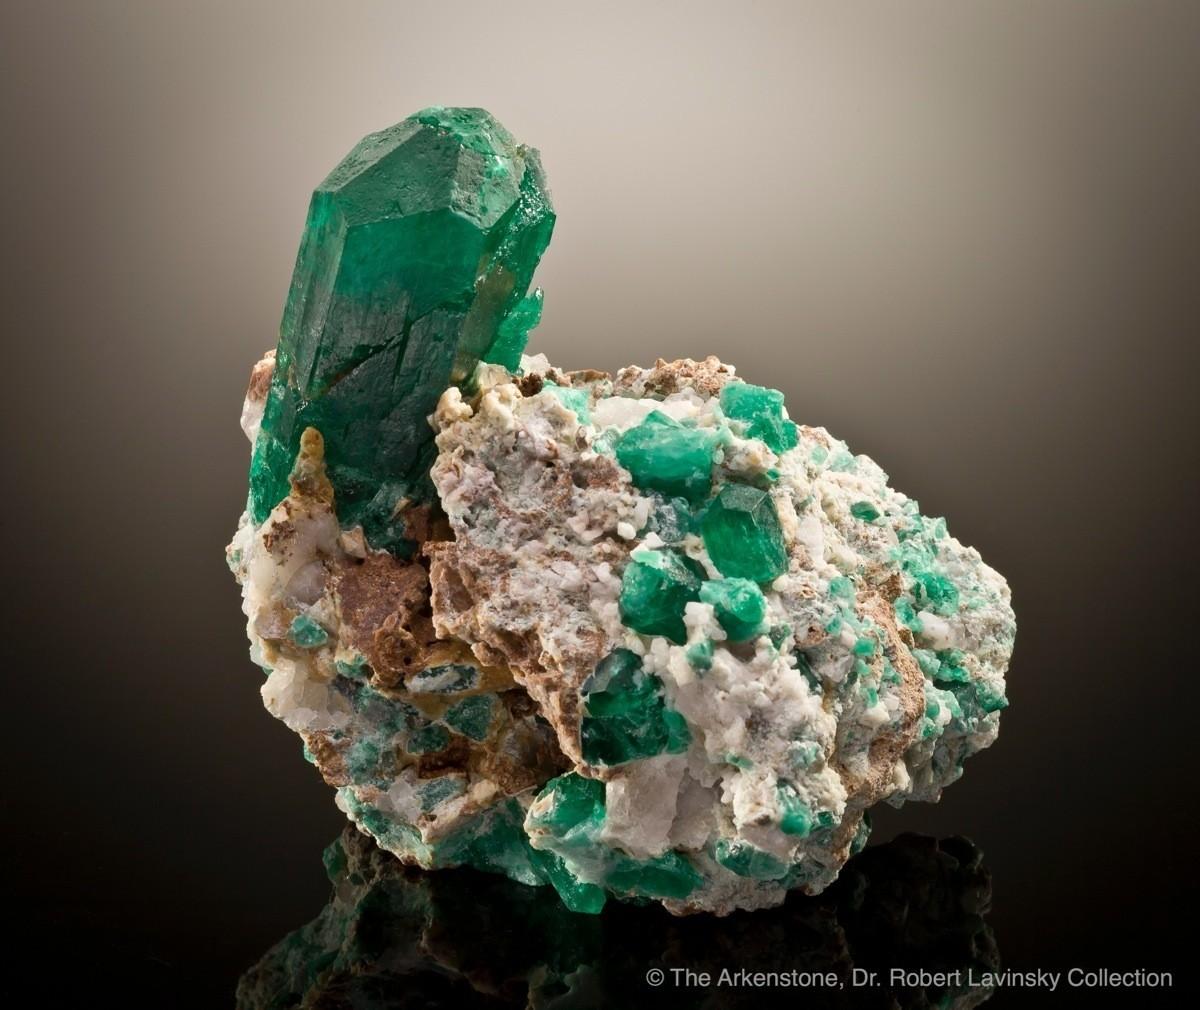 emerald-daftarmine-china-75mm-jb817-02